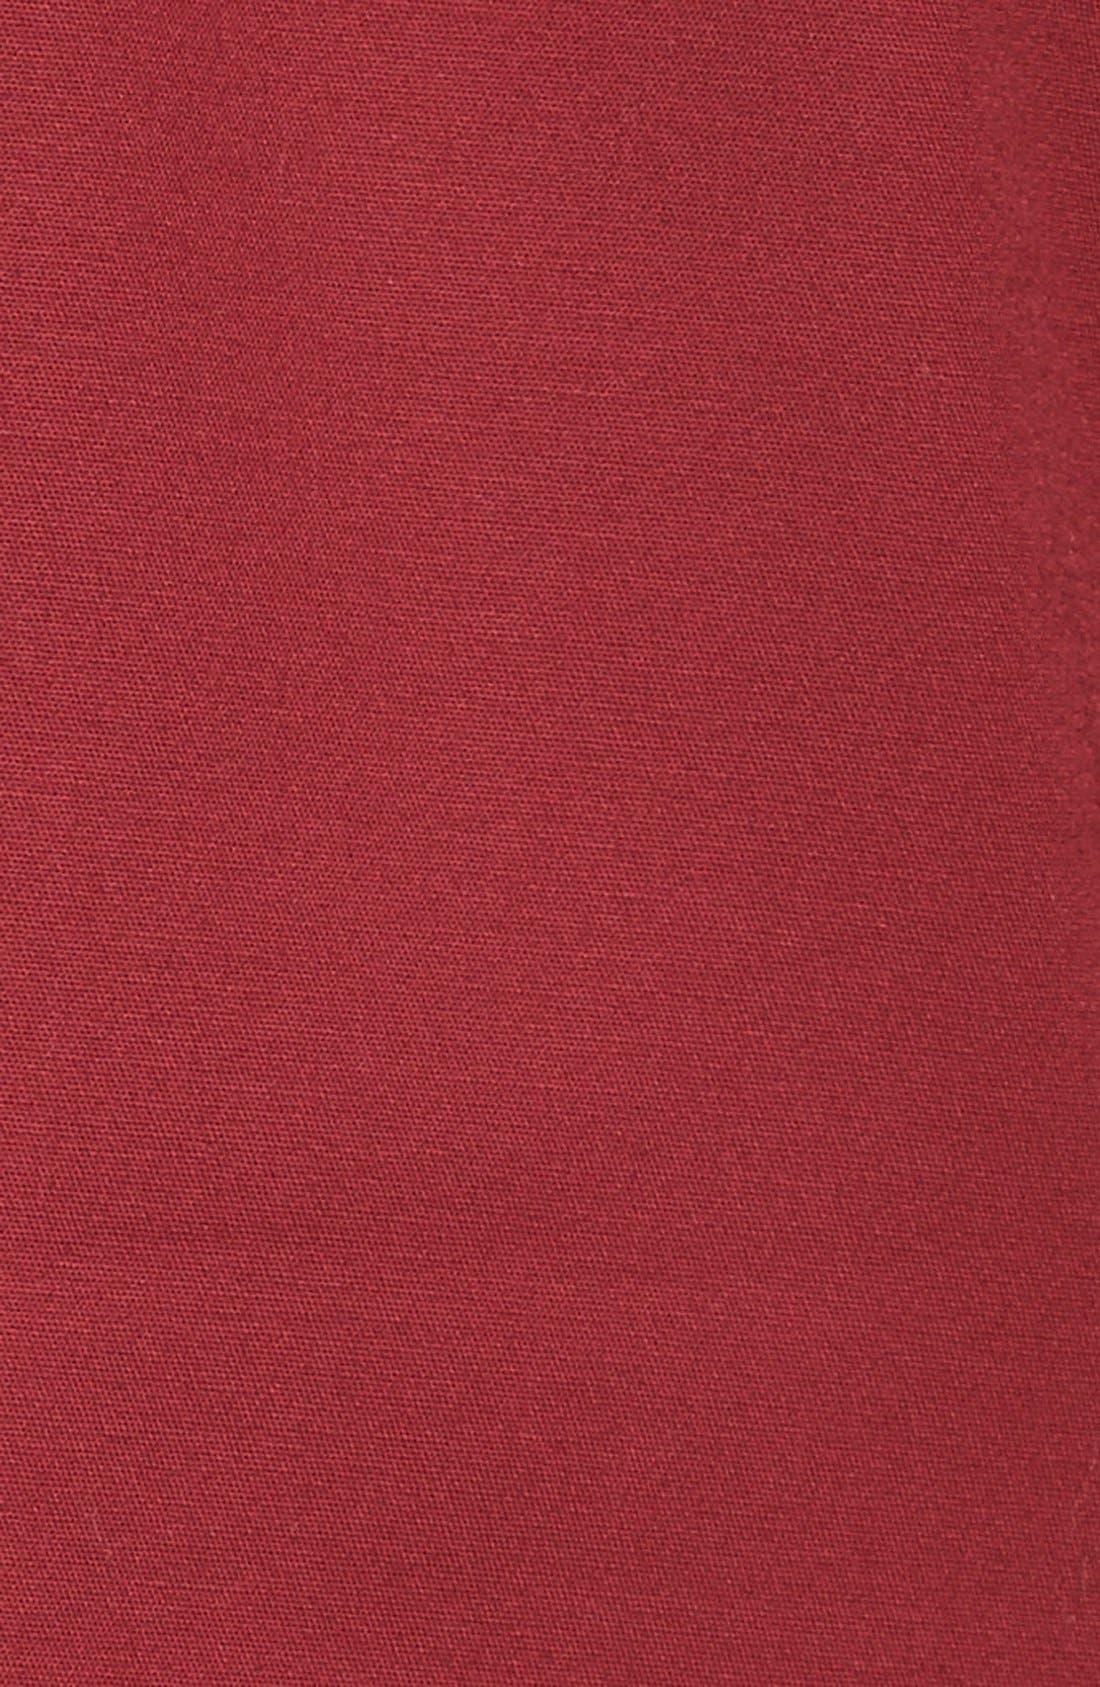 Alternate Image 3  - Vince CamutoStretch Cotton One-Button Blazer